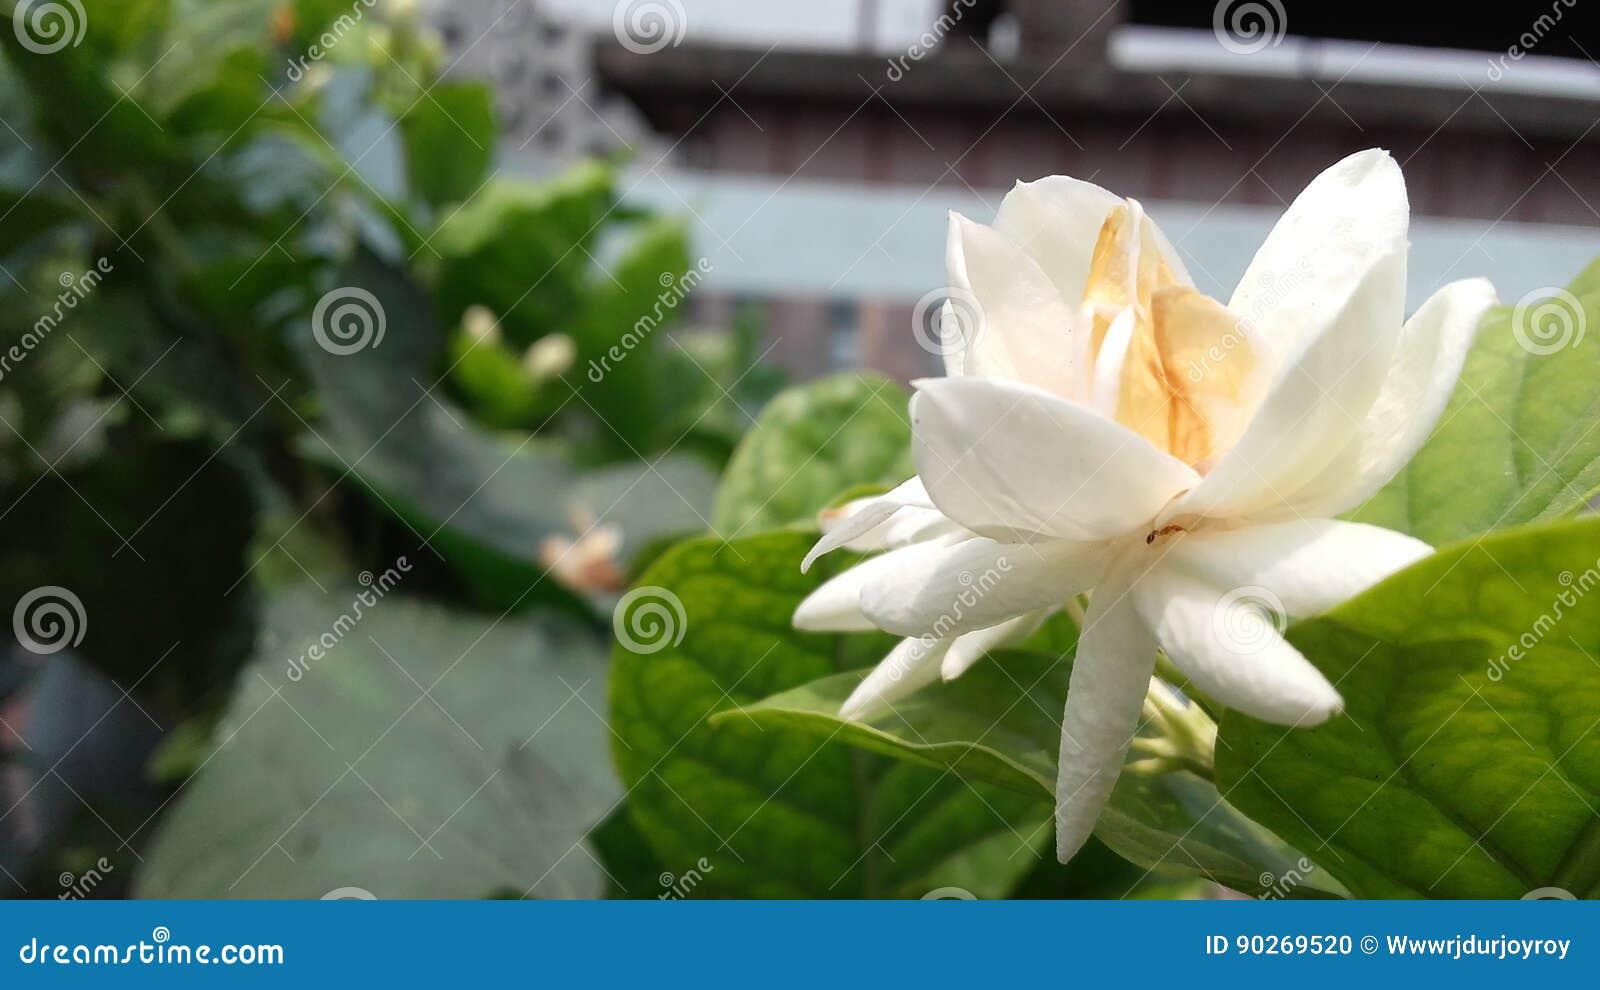 Flower Stock Photo Image Of Whiteis Plant Backyard 90269520